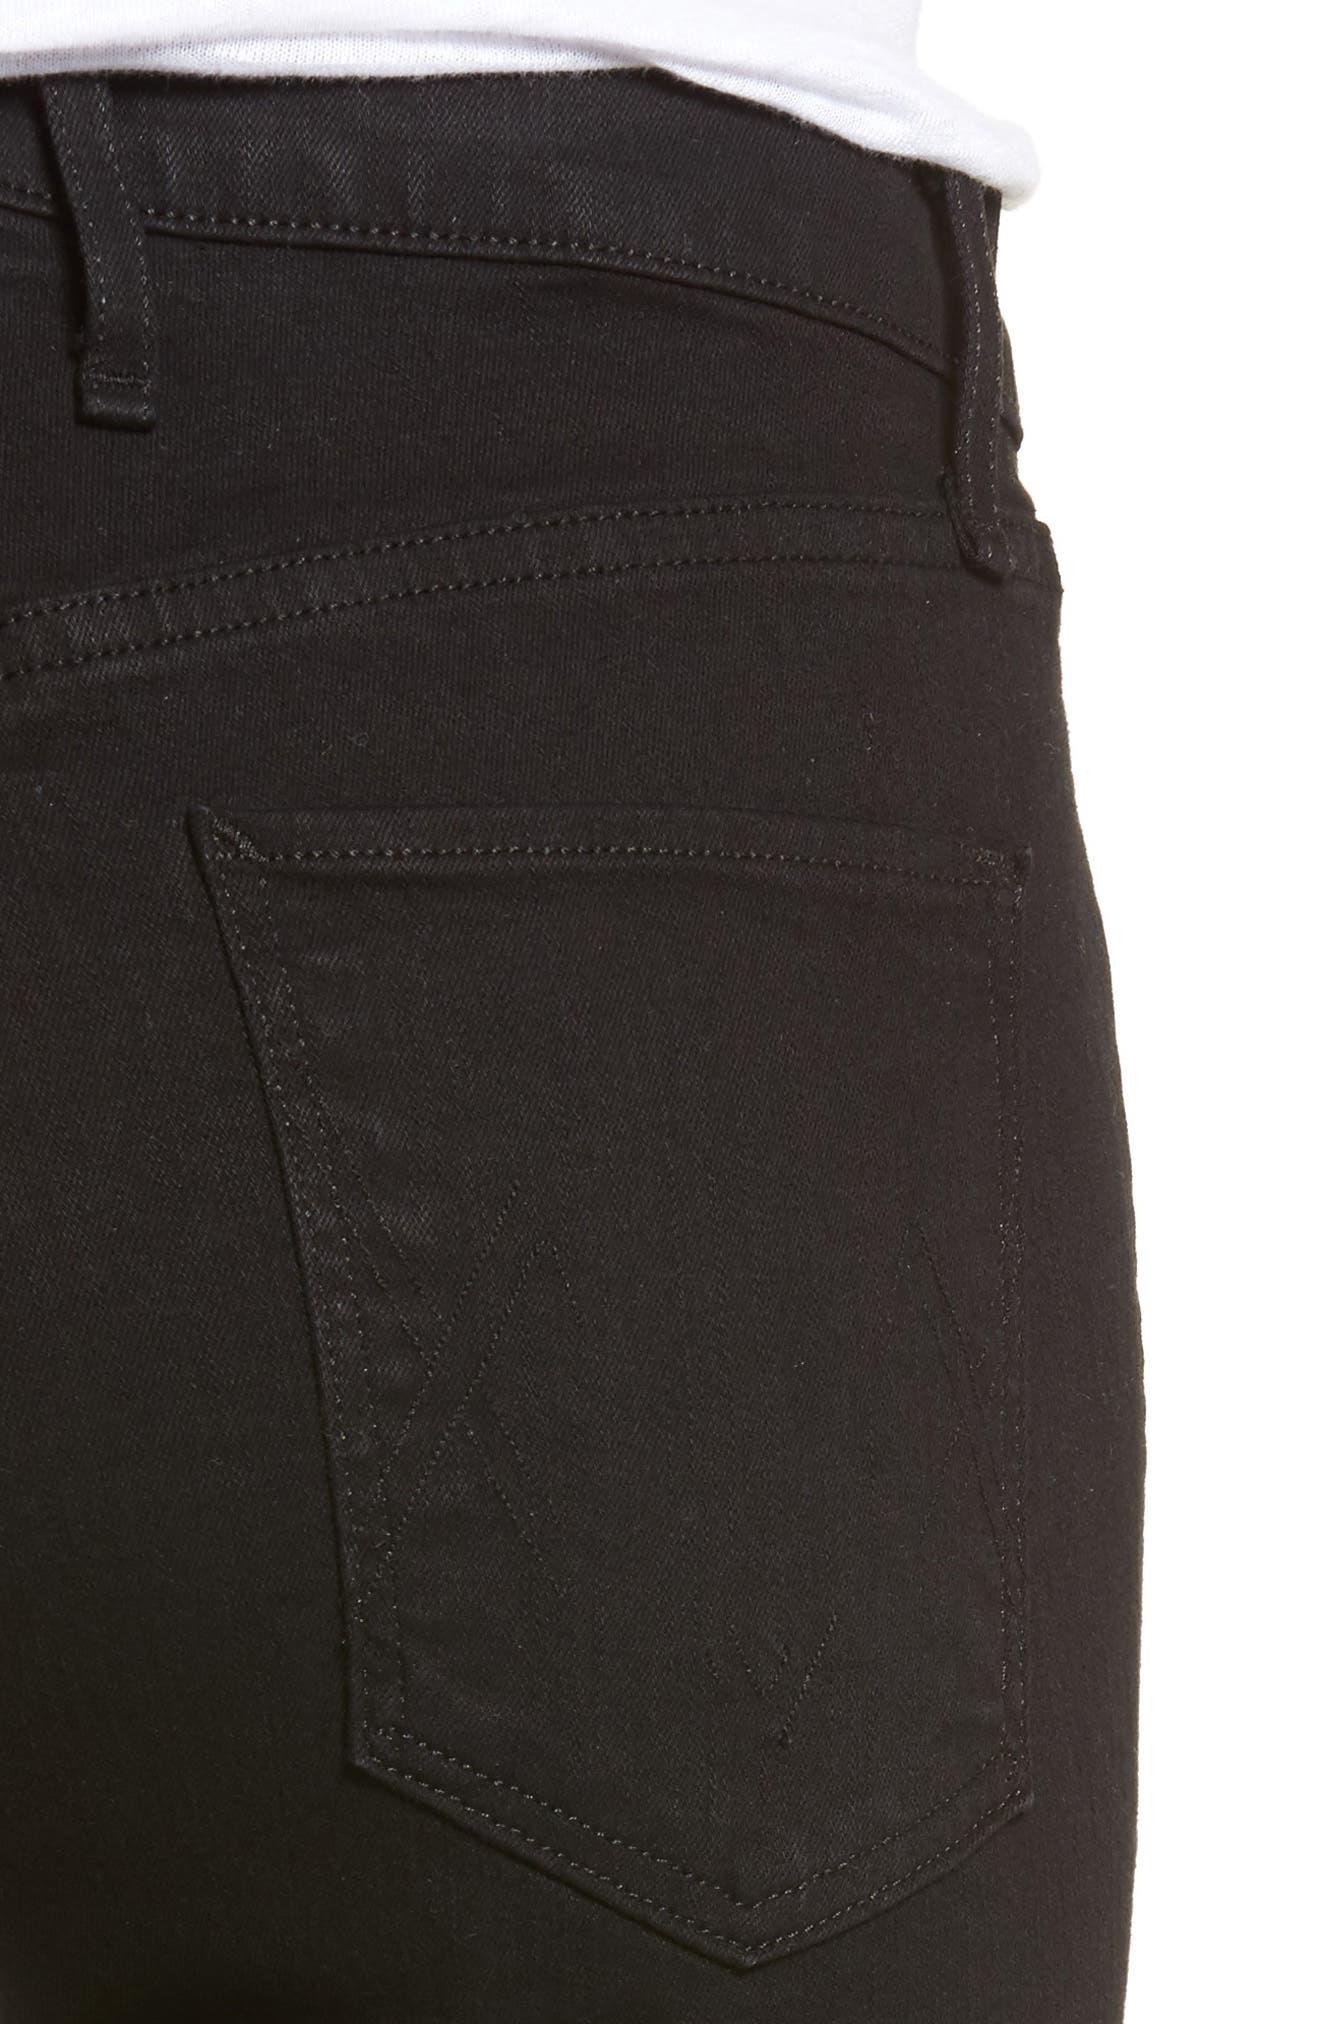 Newton Ankle Skinny Jeans,                             Alternate thumbnail 4, color,                             001